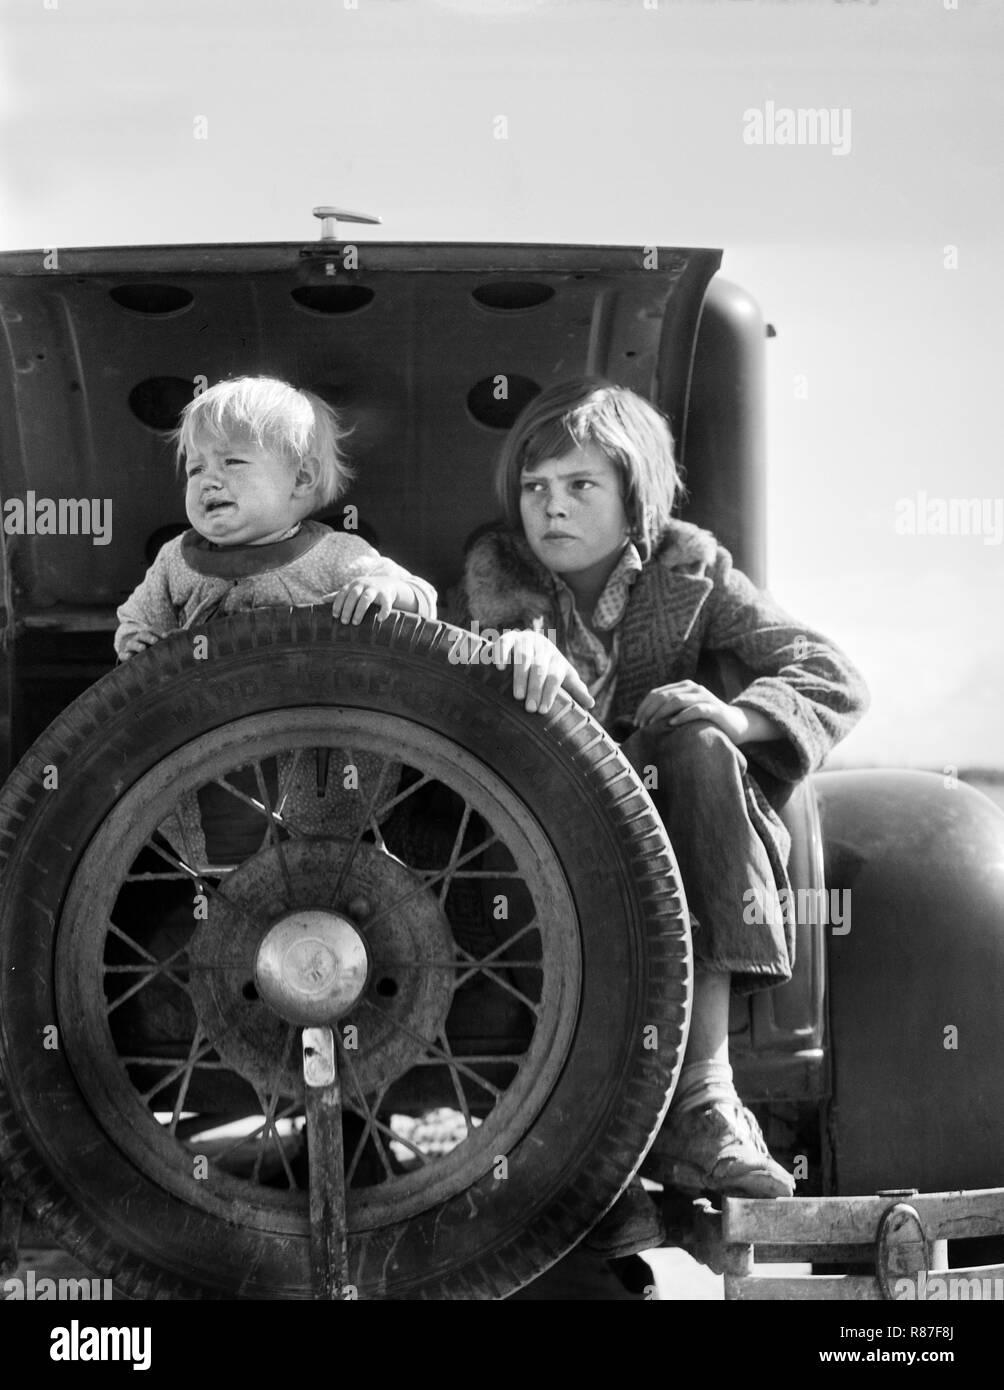 Two Oklahoma Refugees, California, USA, Dorothea Lange, Farm Security Administration, February 1936 - Stock Image